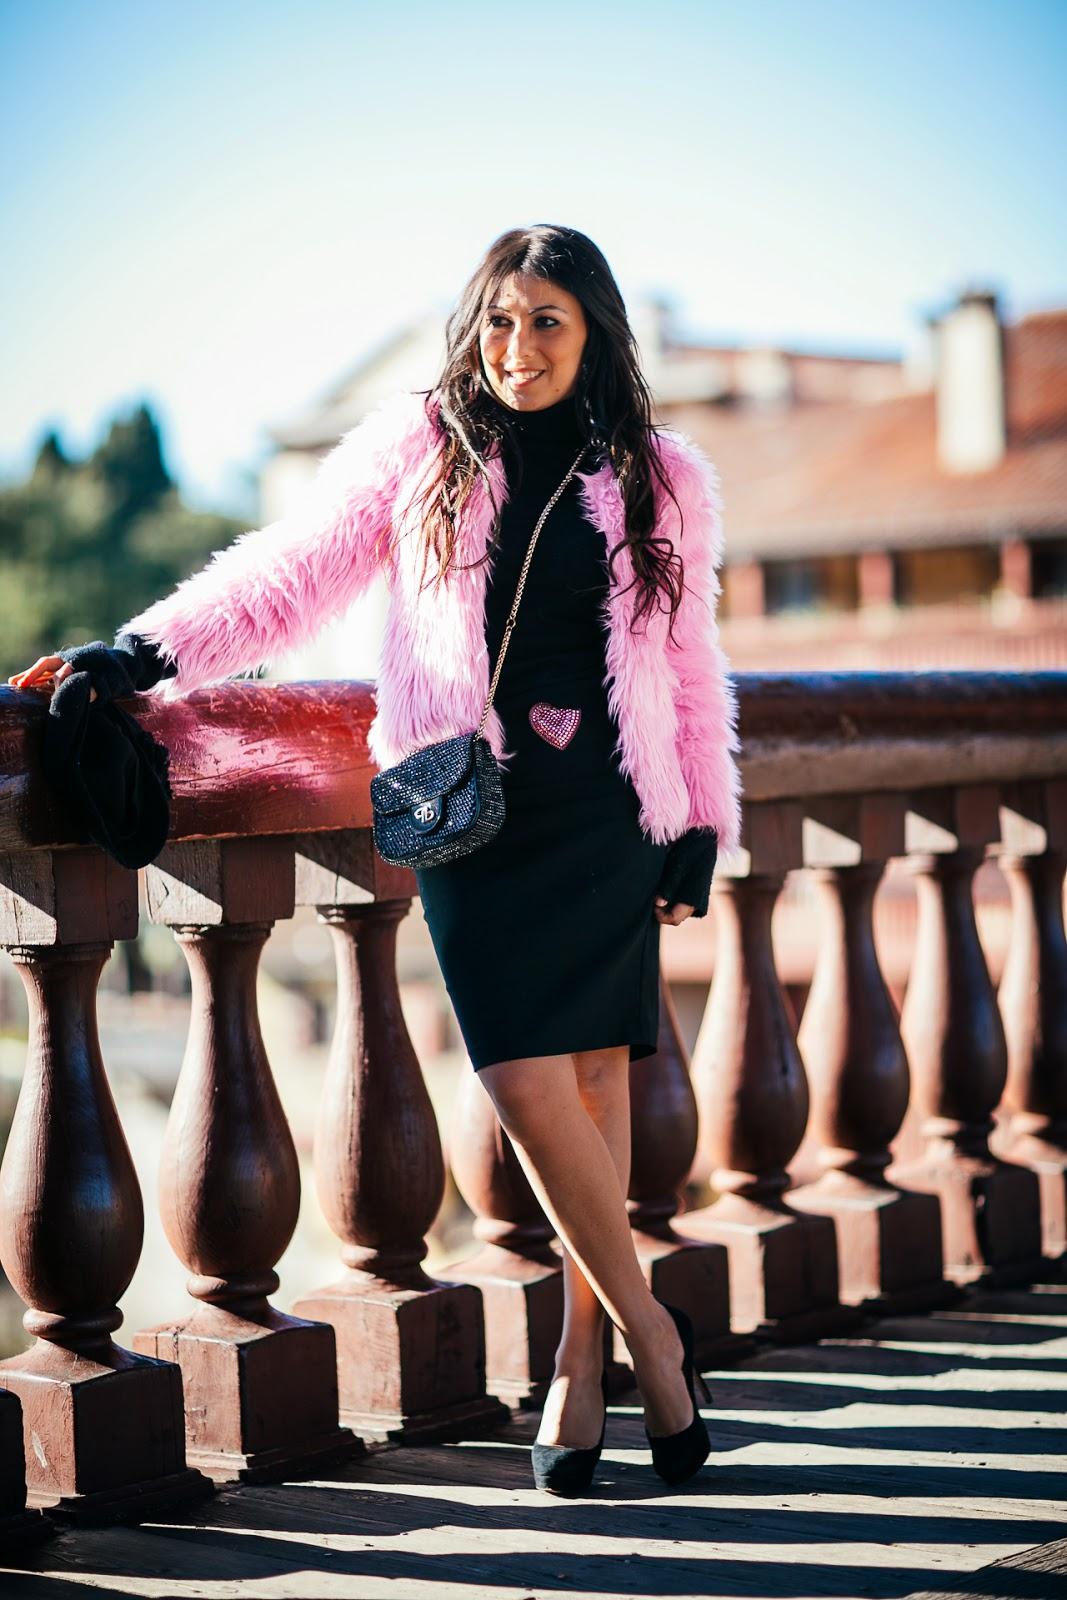 http://www.oasap.com/coats-jackets/48227-vintage-pink-faux-fur-coat.html/?fuid=235465